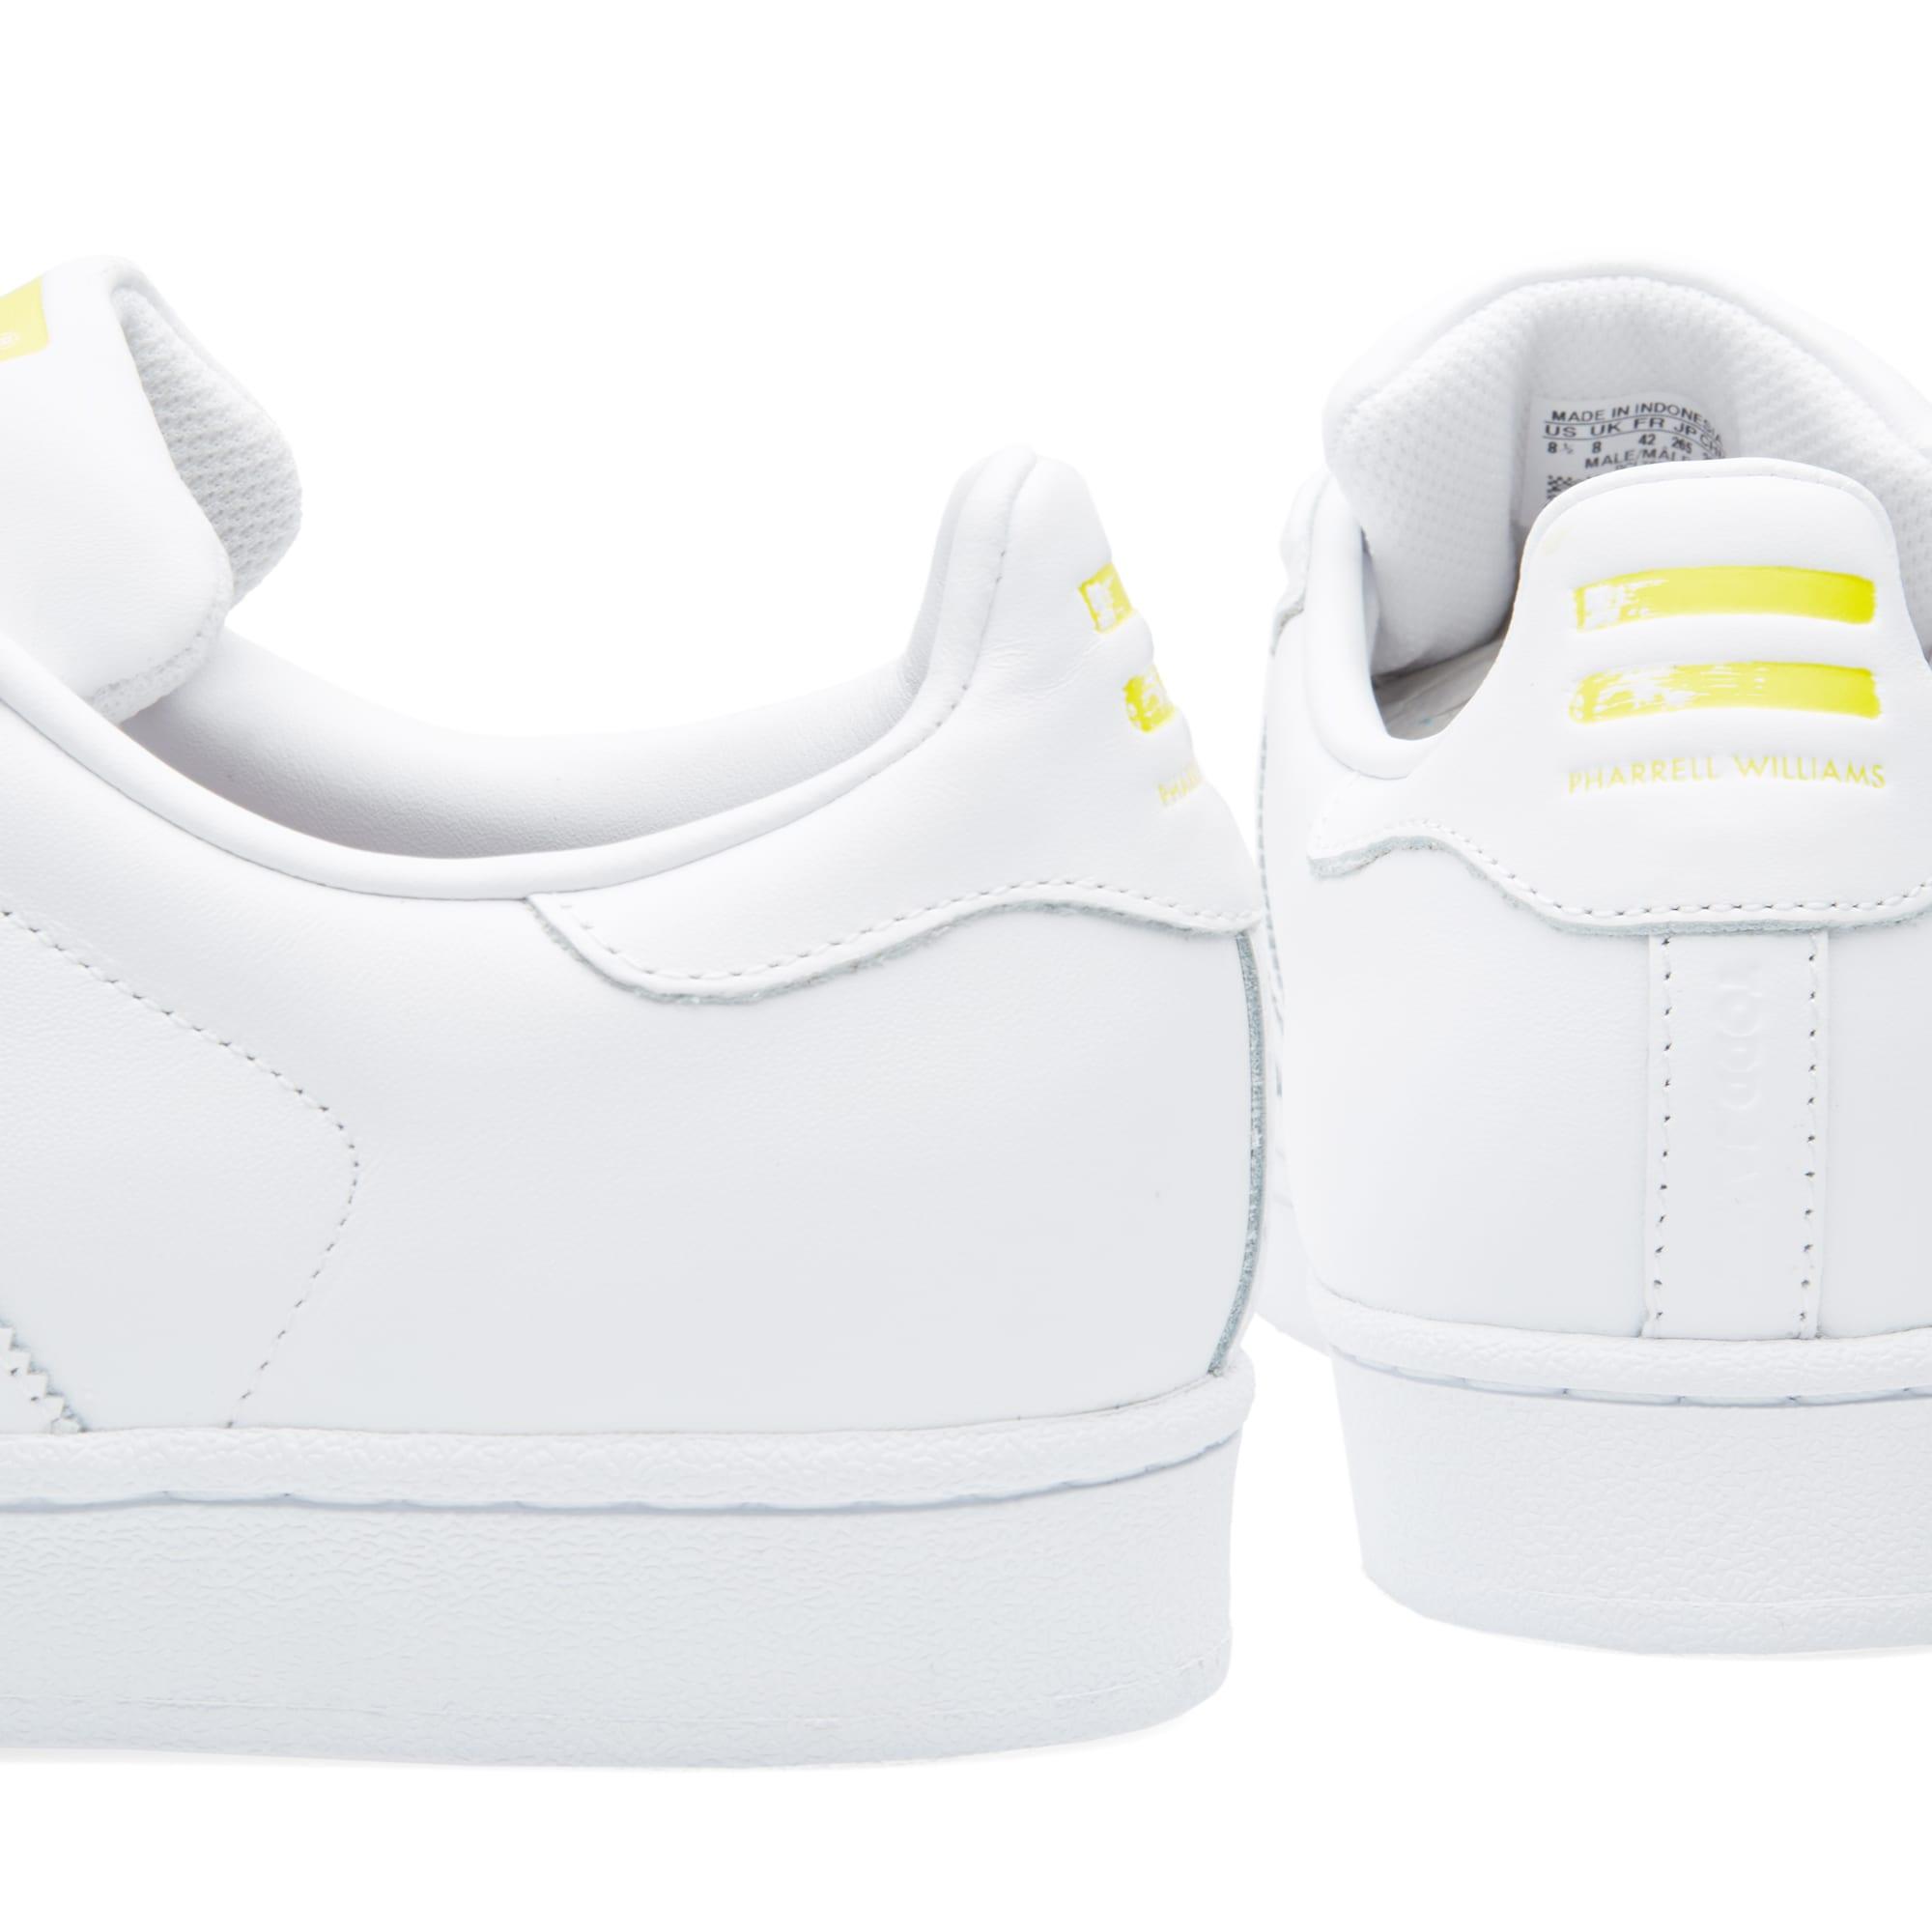 470ede51548402 Adidas x Pharrell Superstar Supershell White   Yellow